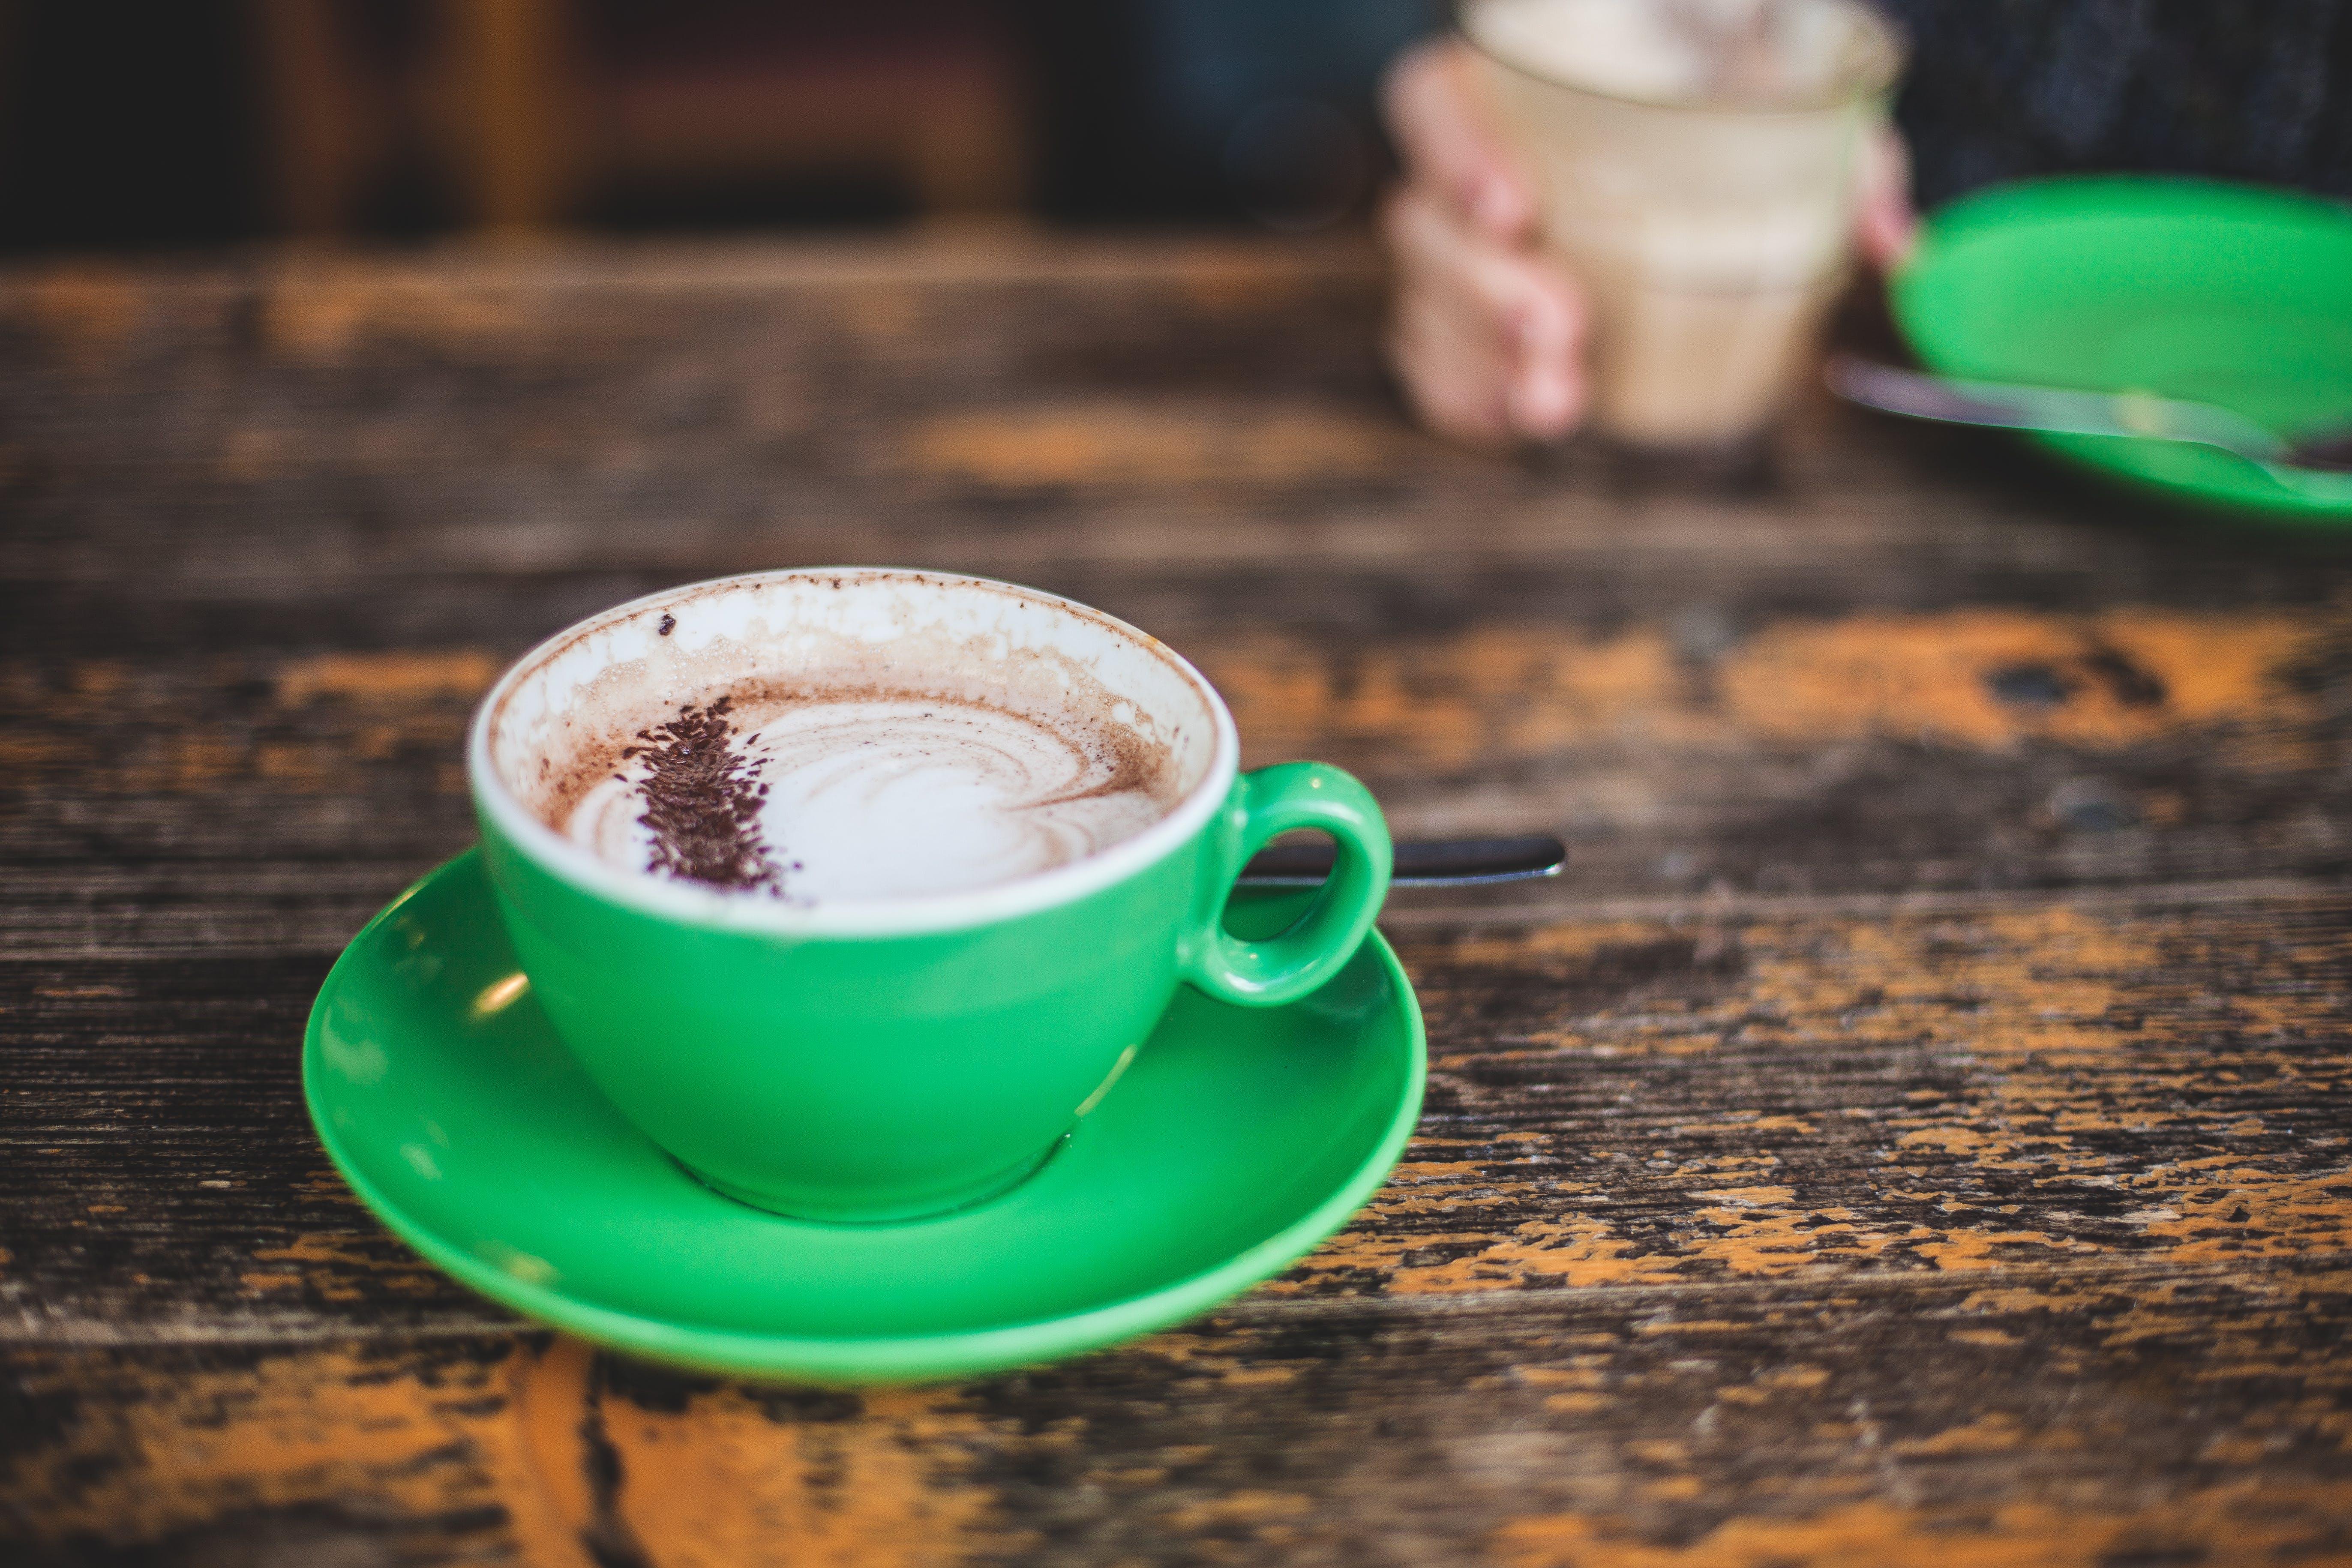 White Ceramic Mug With Cappuccino